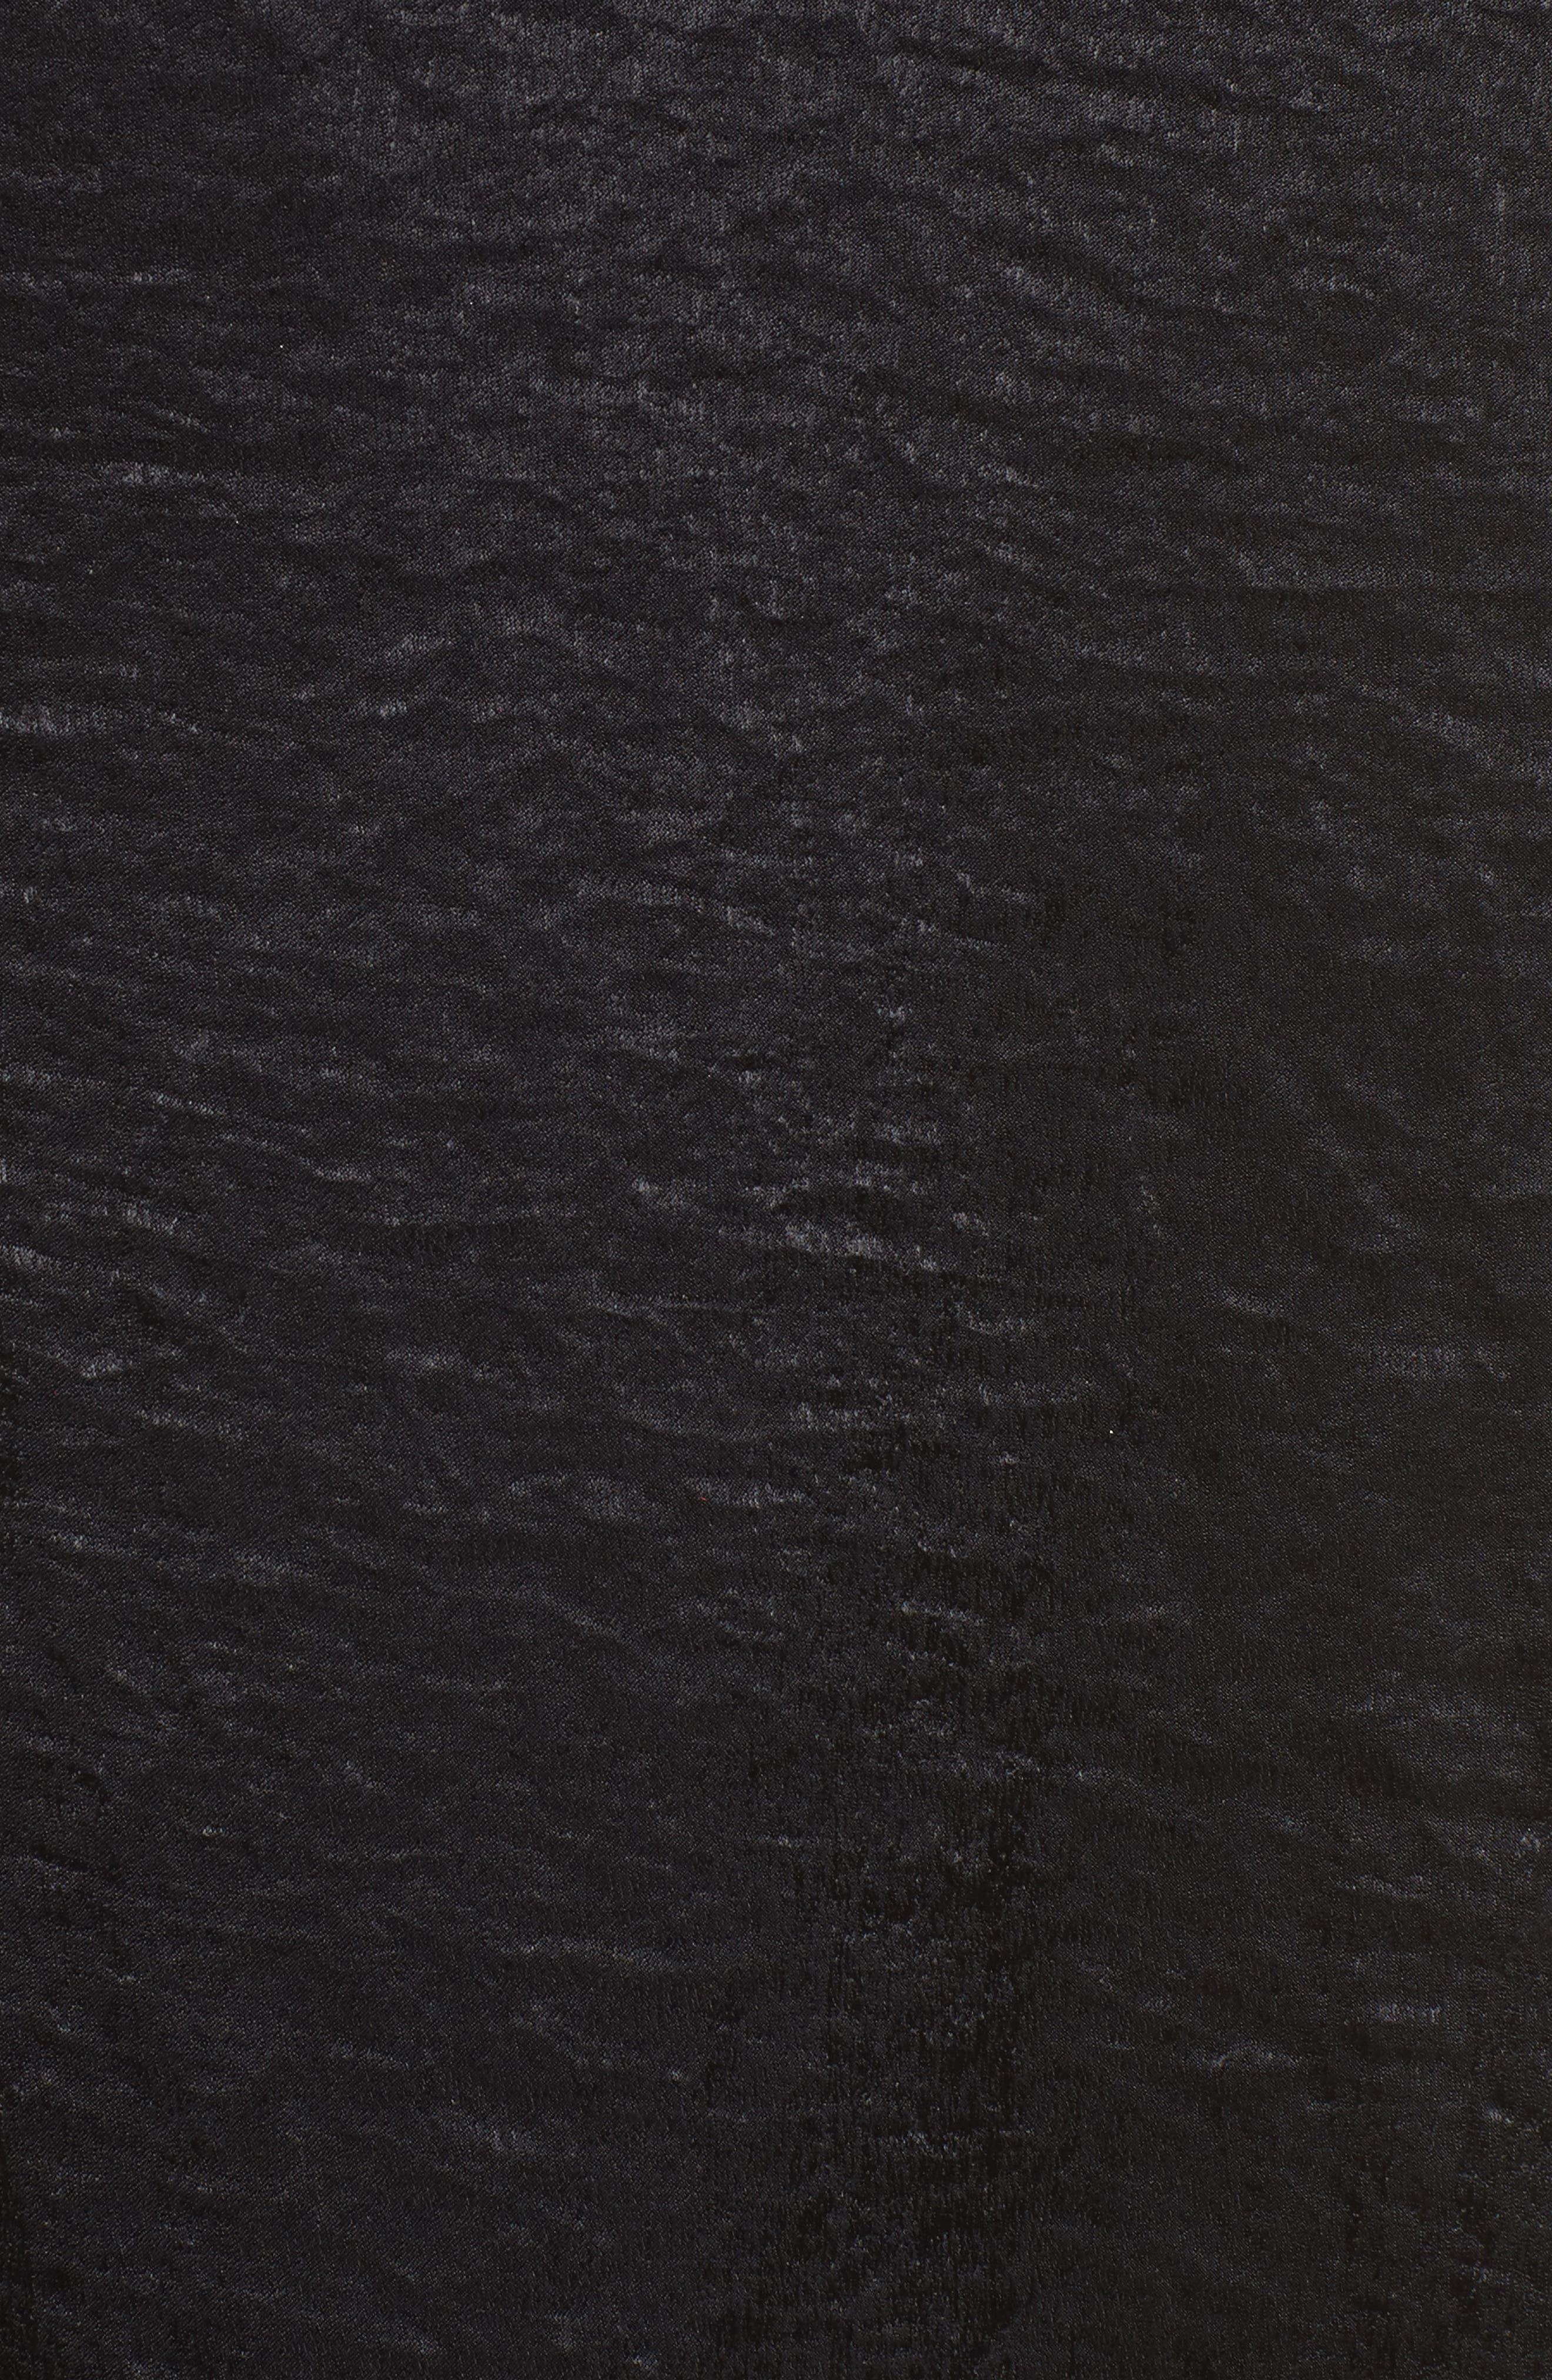 Anita Wrap Maxi Dress,                             Alternate thumbnail 5, color,                             Black Silky Satin